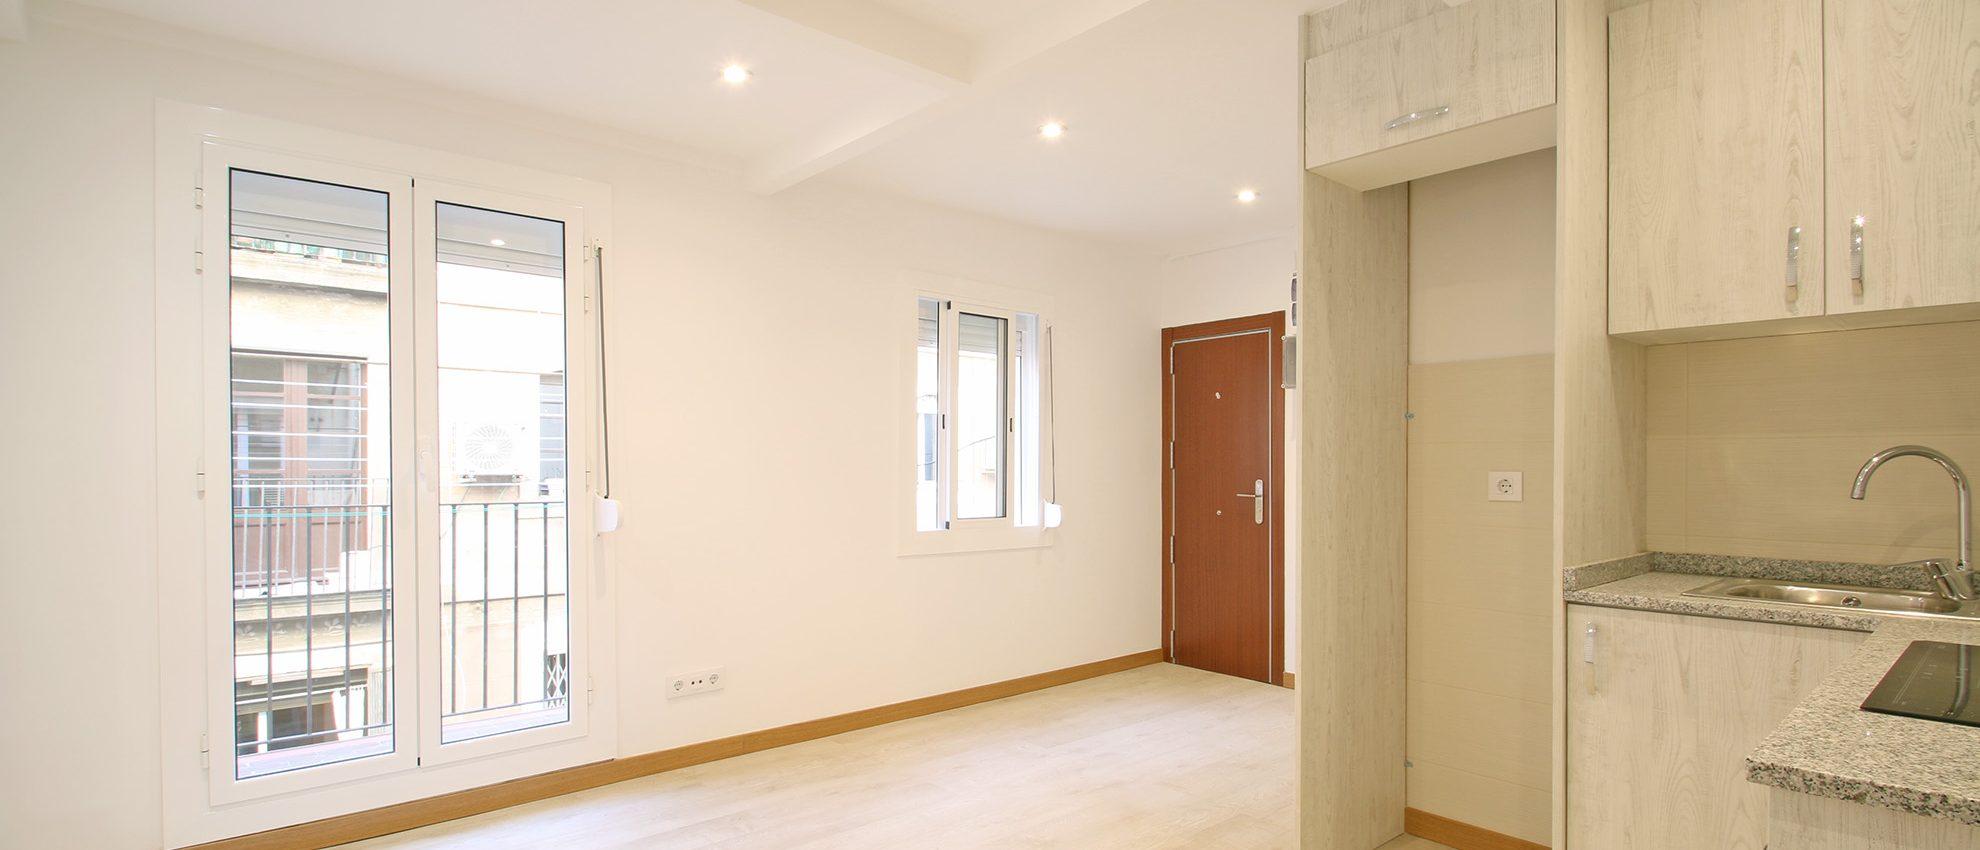 Vila Joiosa 5 apartment